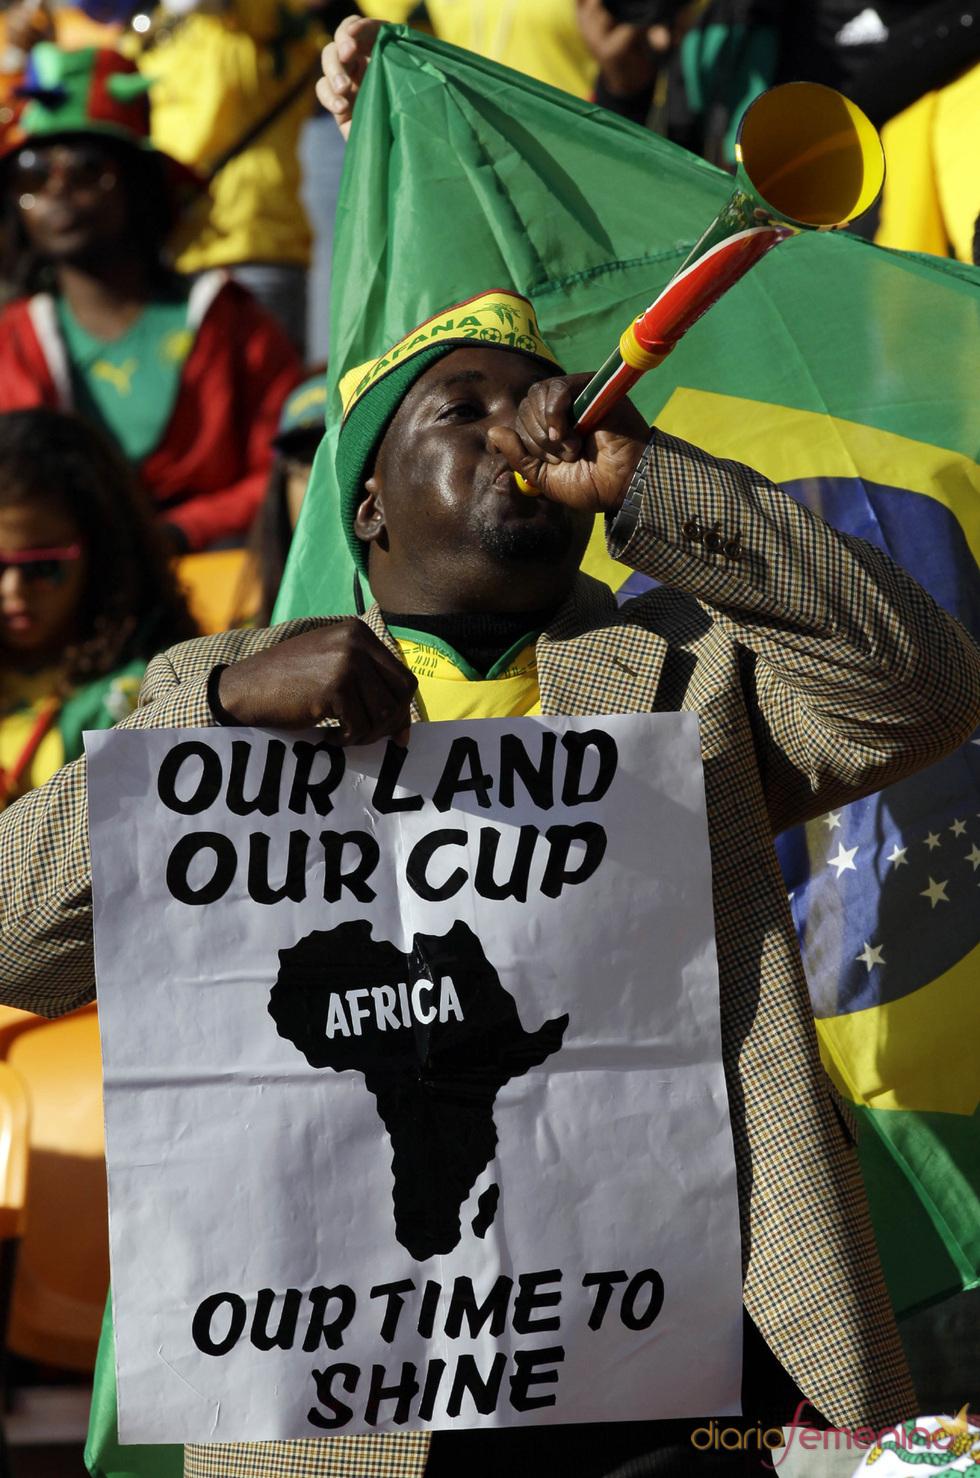 ¡Viva África! Empieza la fiesta del Mundial 2010